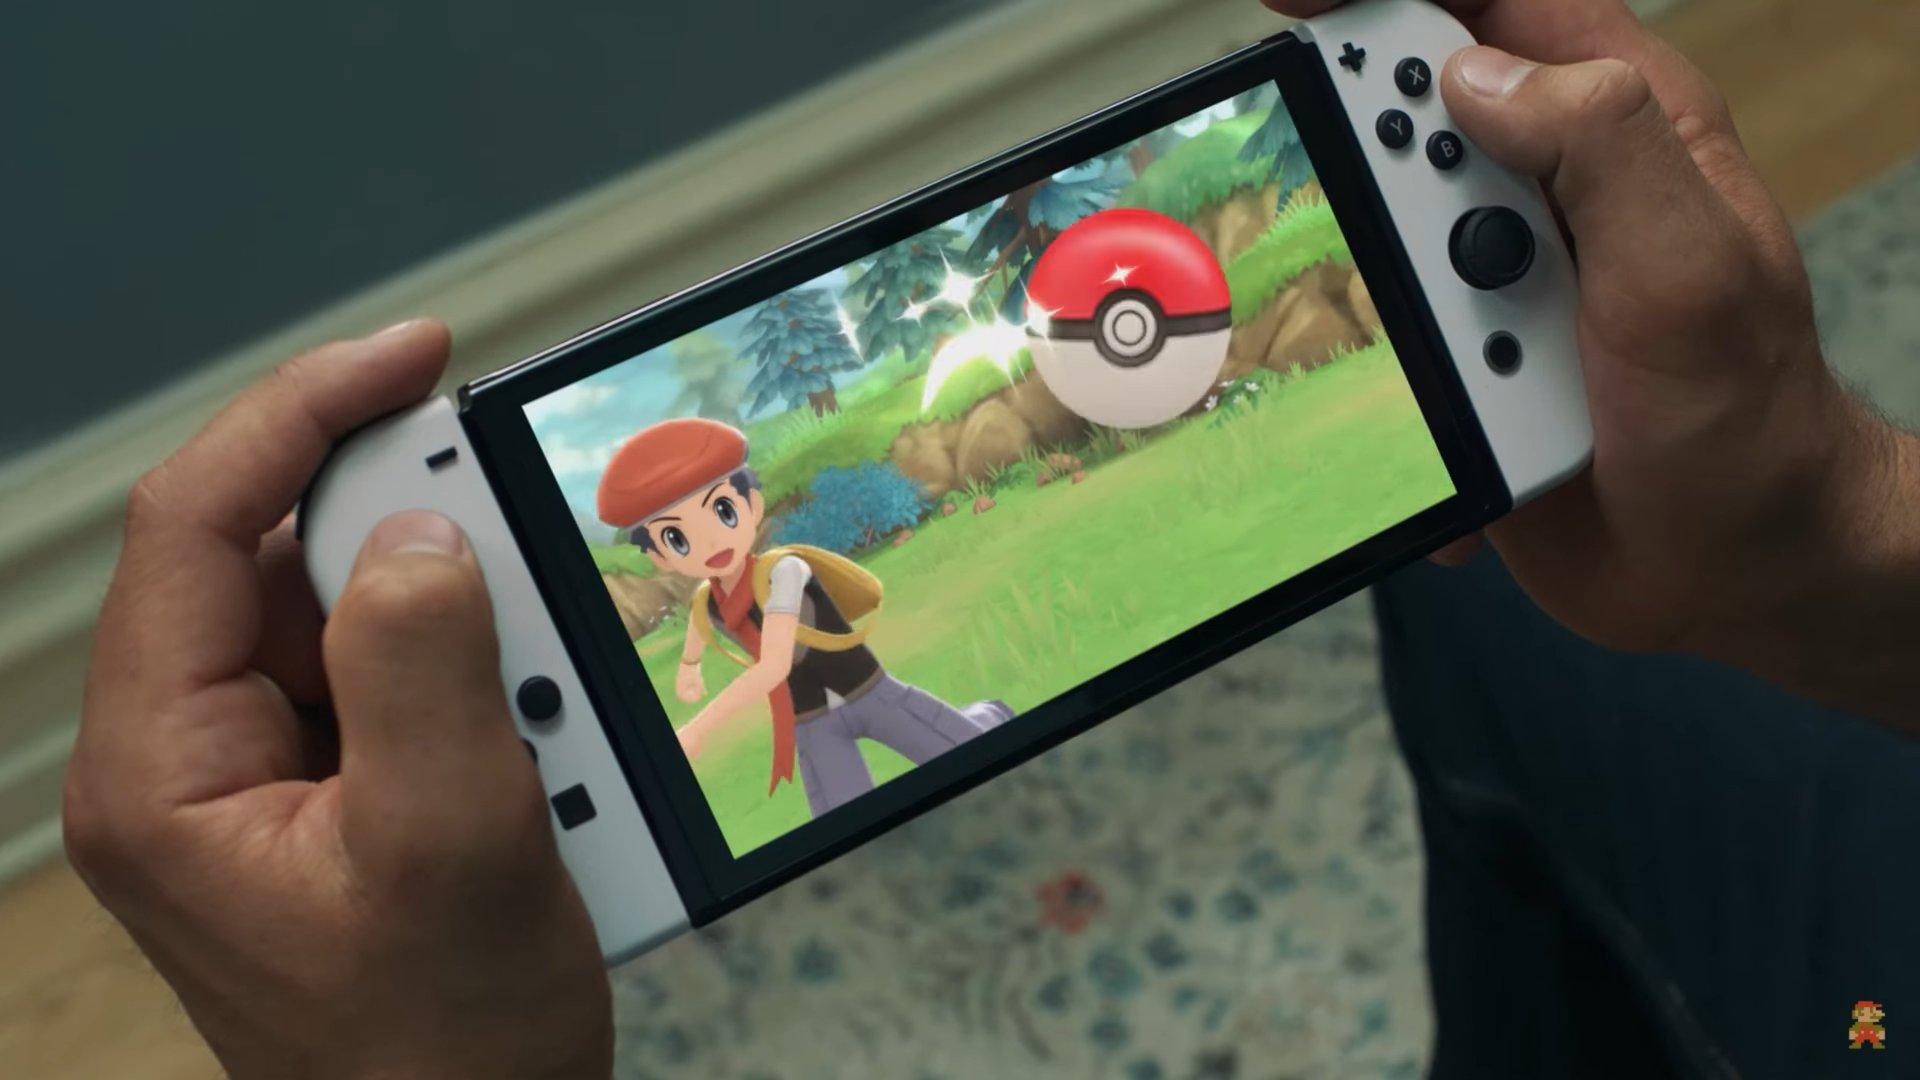 Pokémon Diamante y Perla Switch Oled